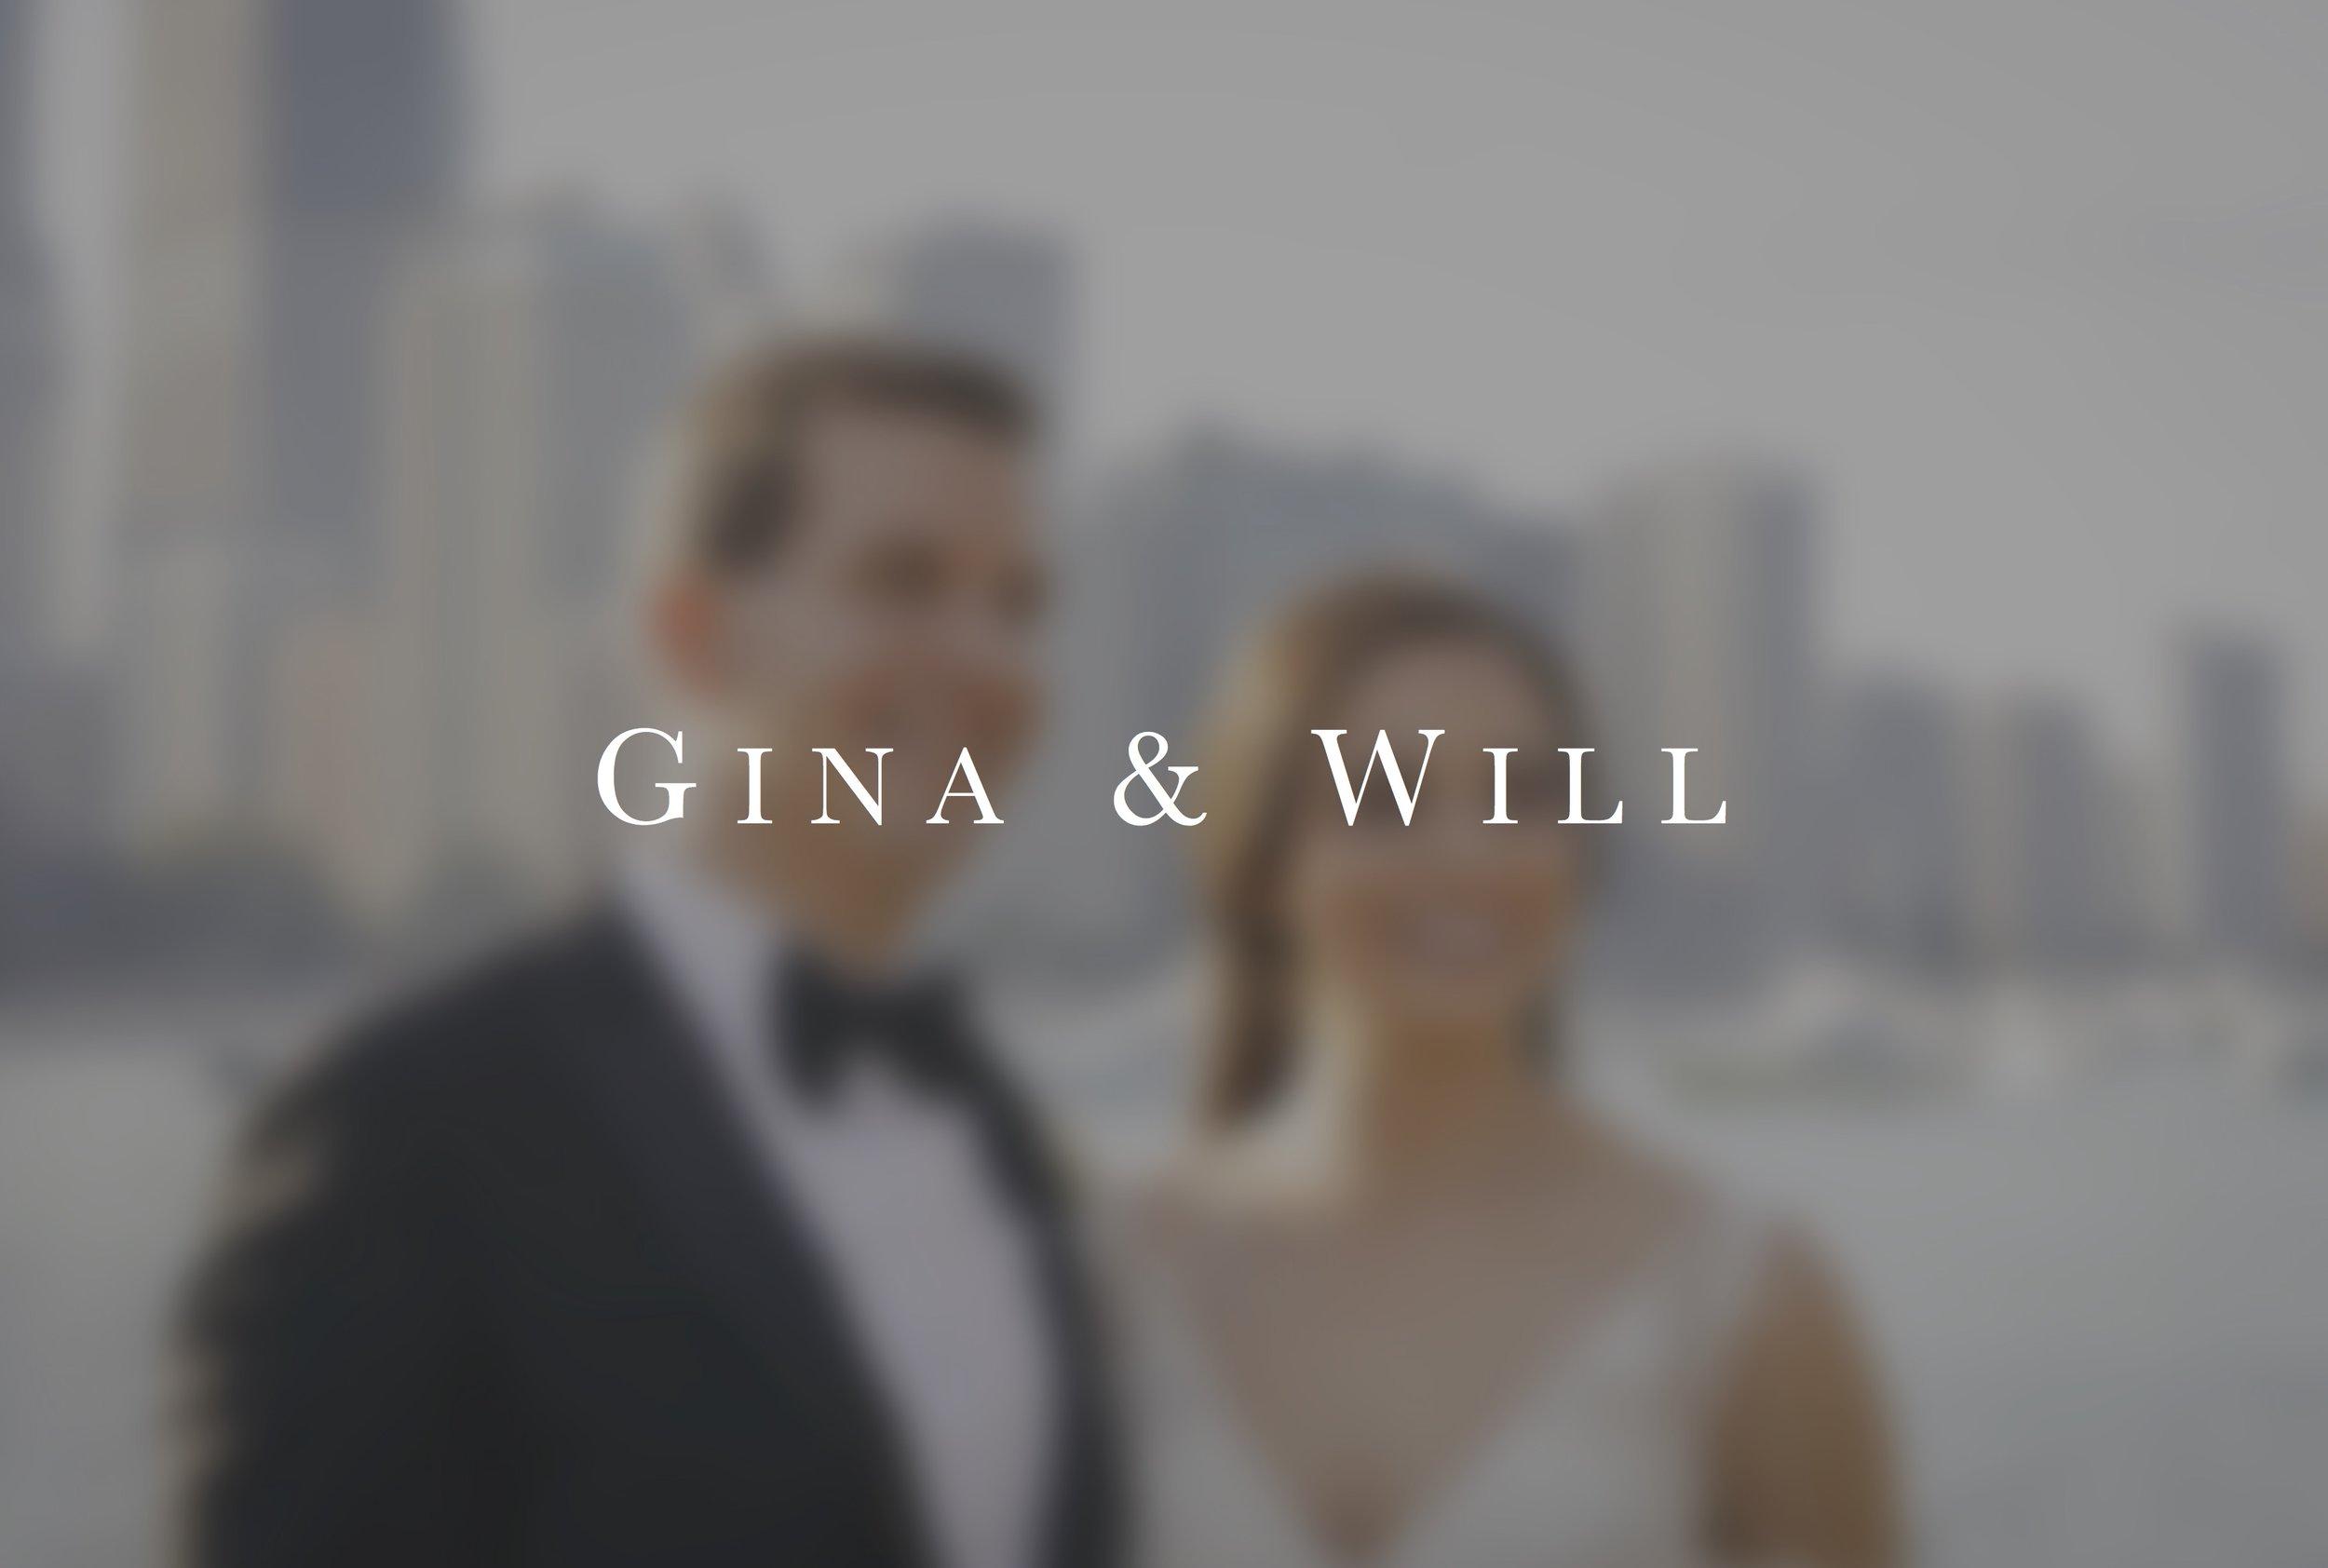 Gina & Will Title.jpg